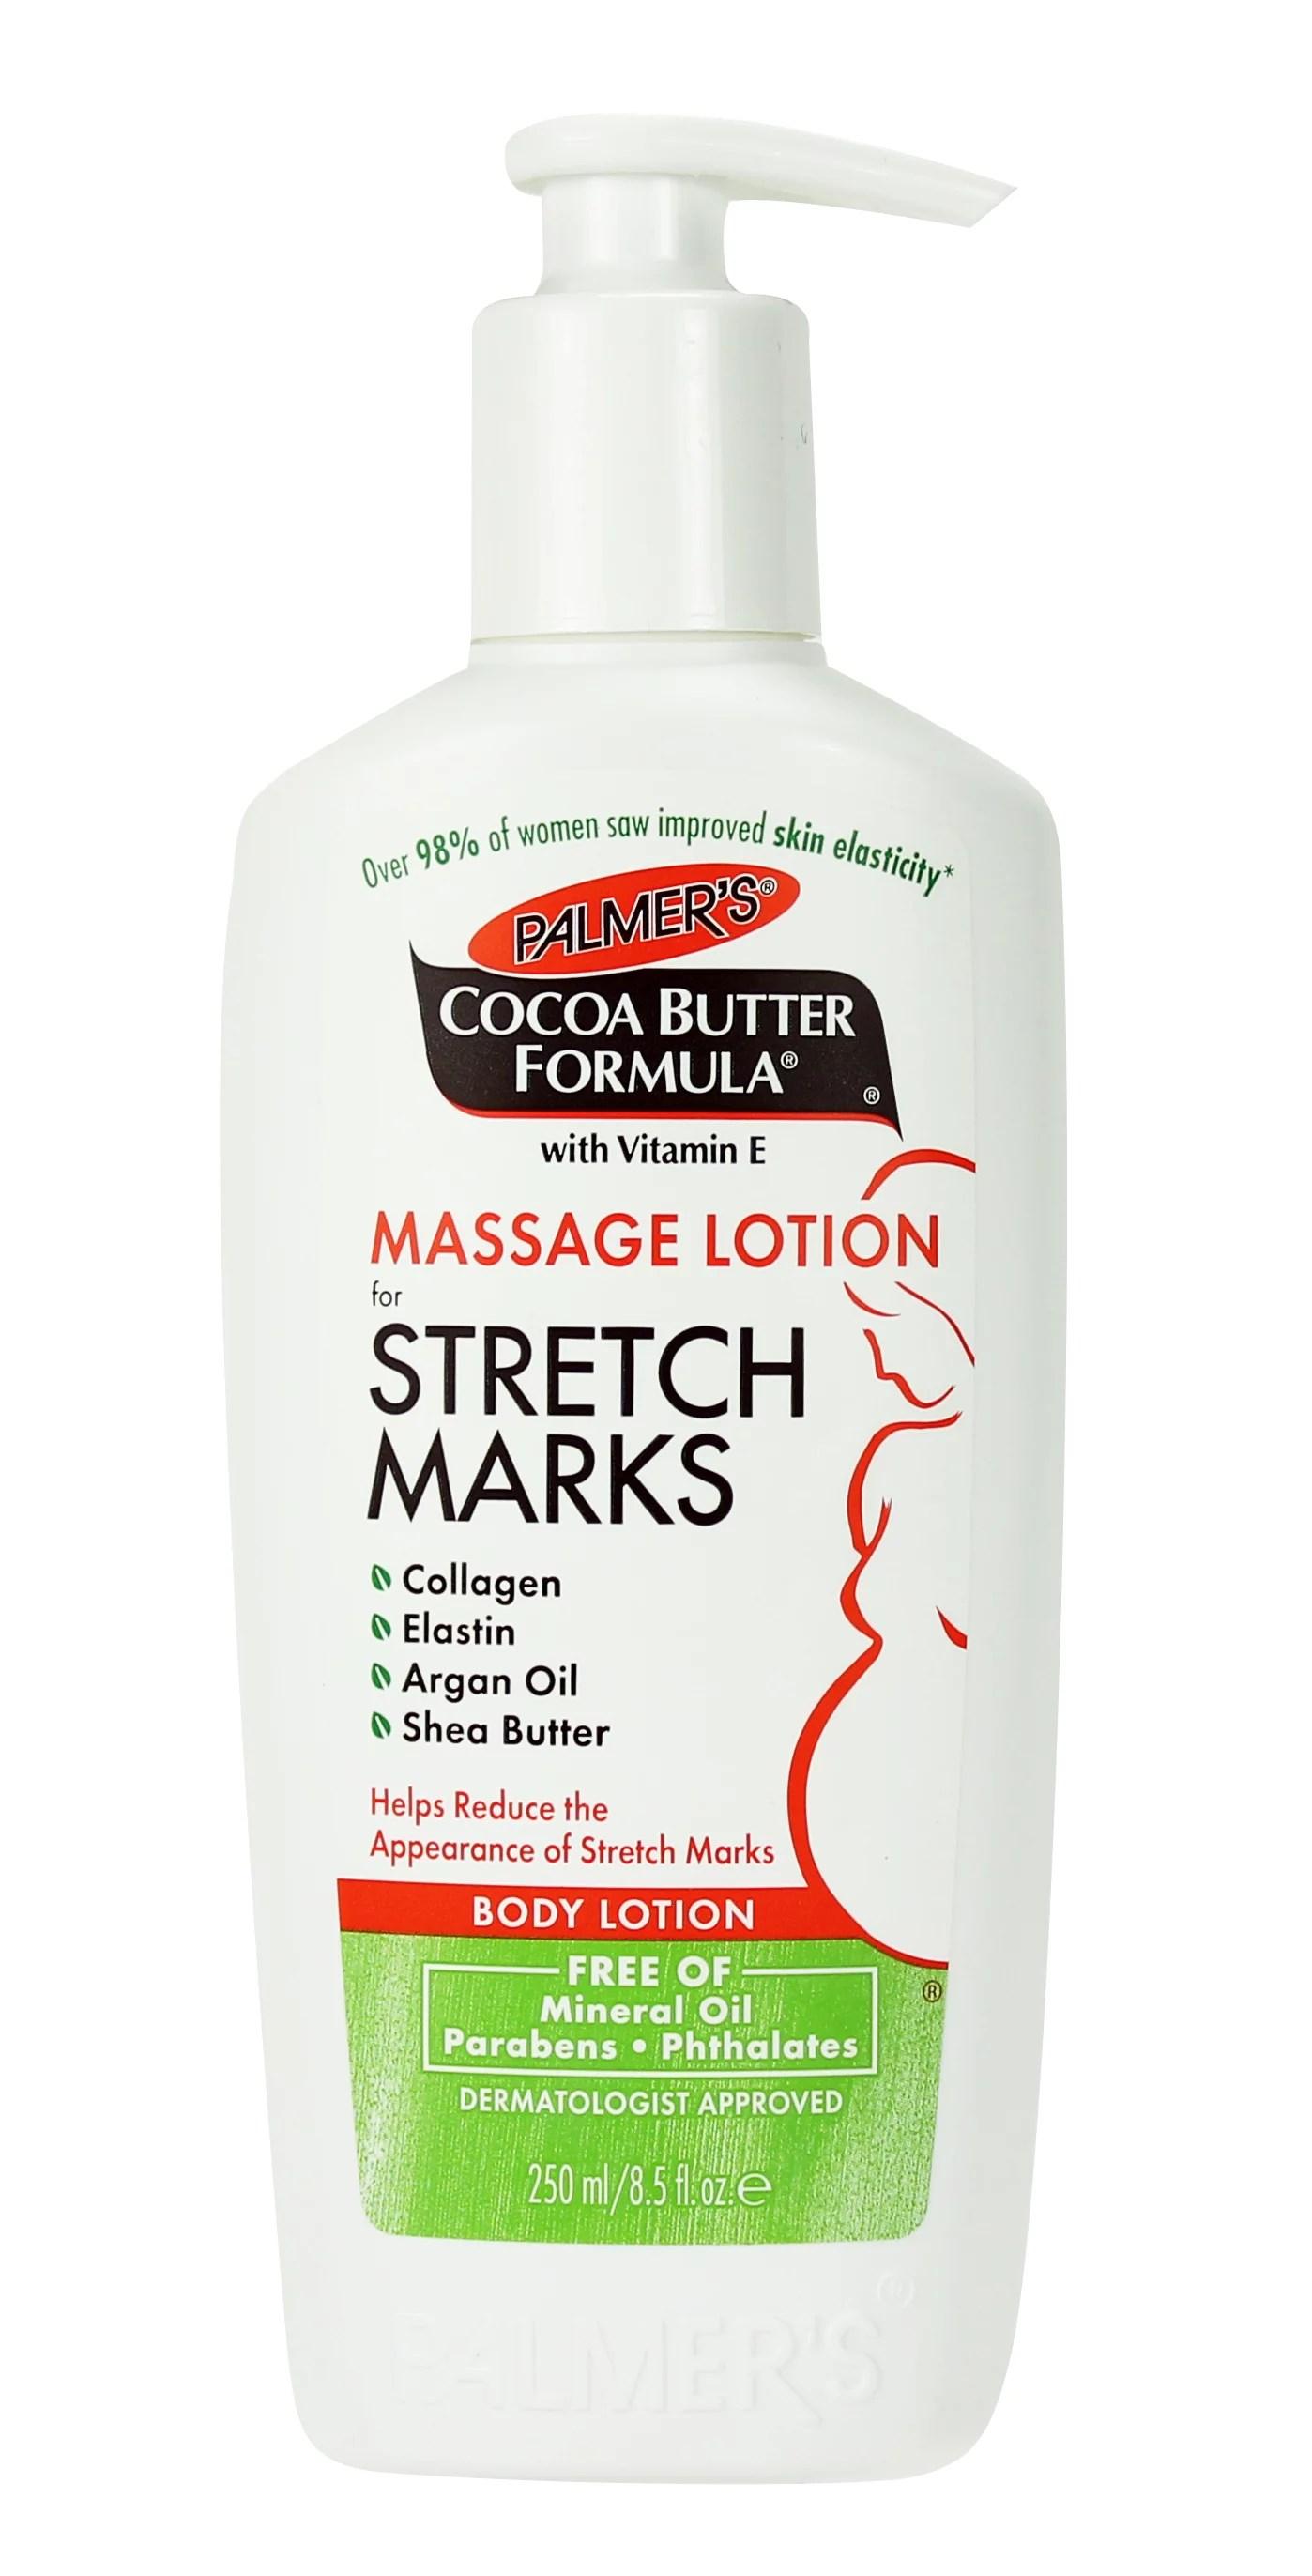 Palmers Mark Stretch Lotion Reviews